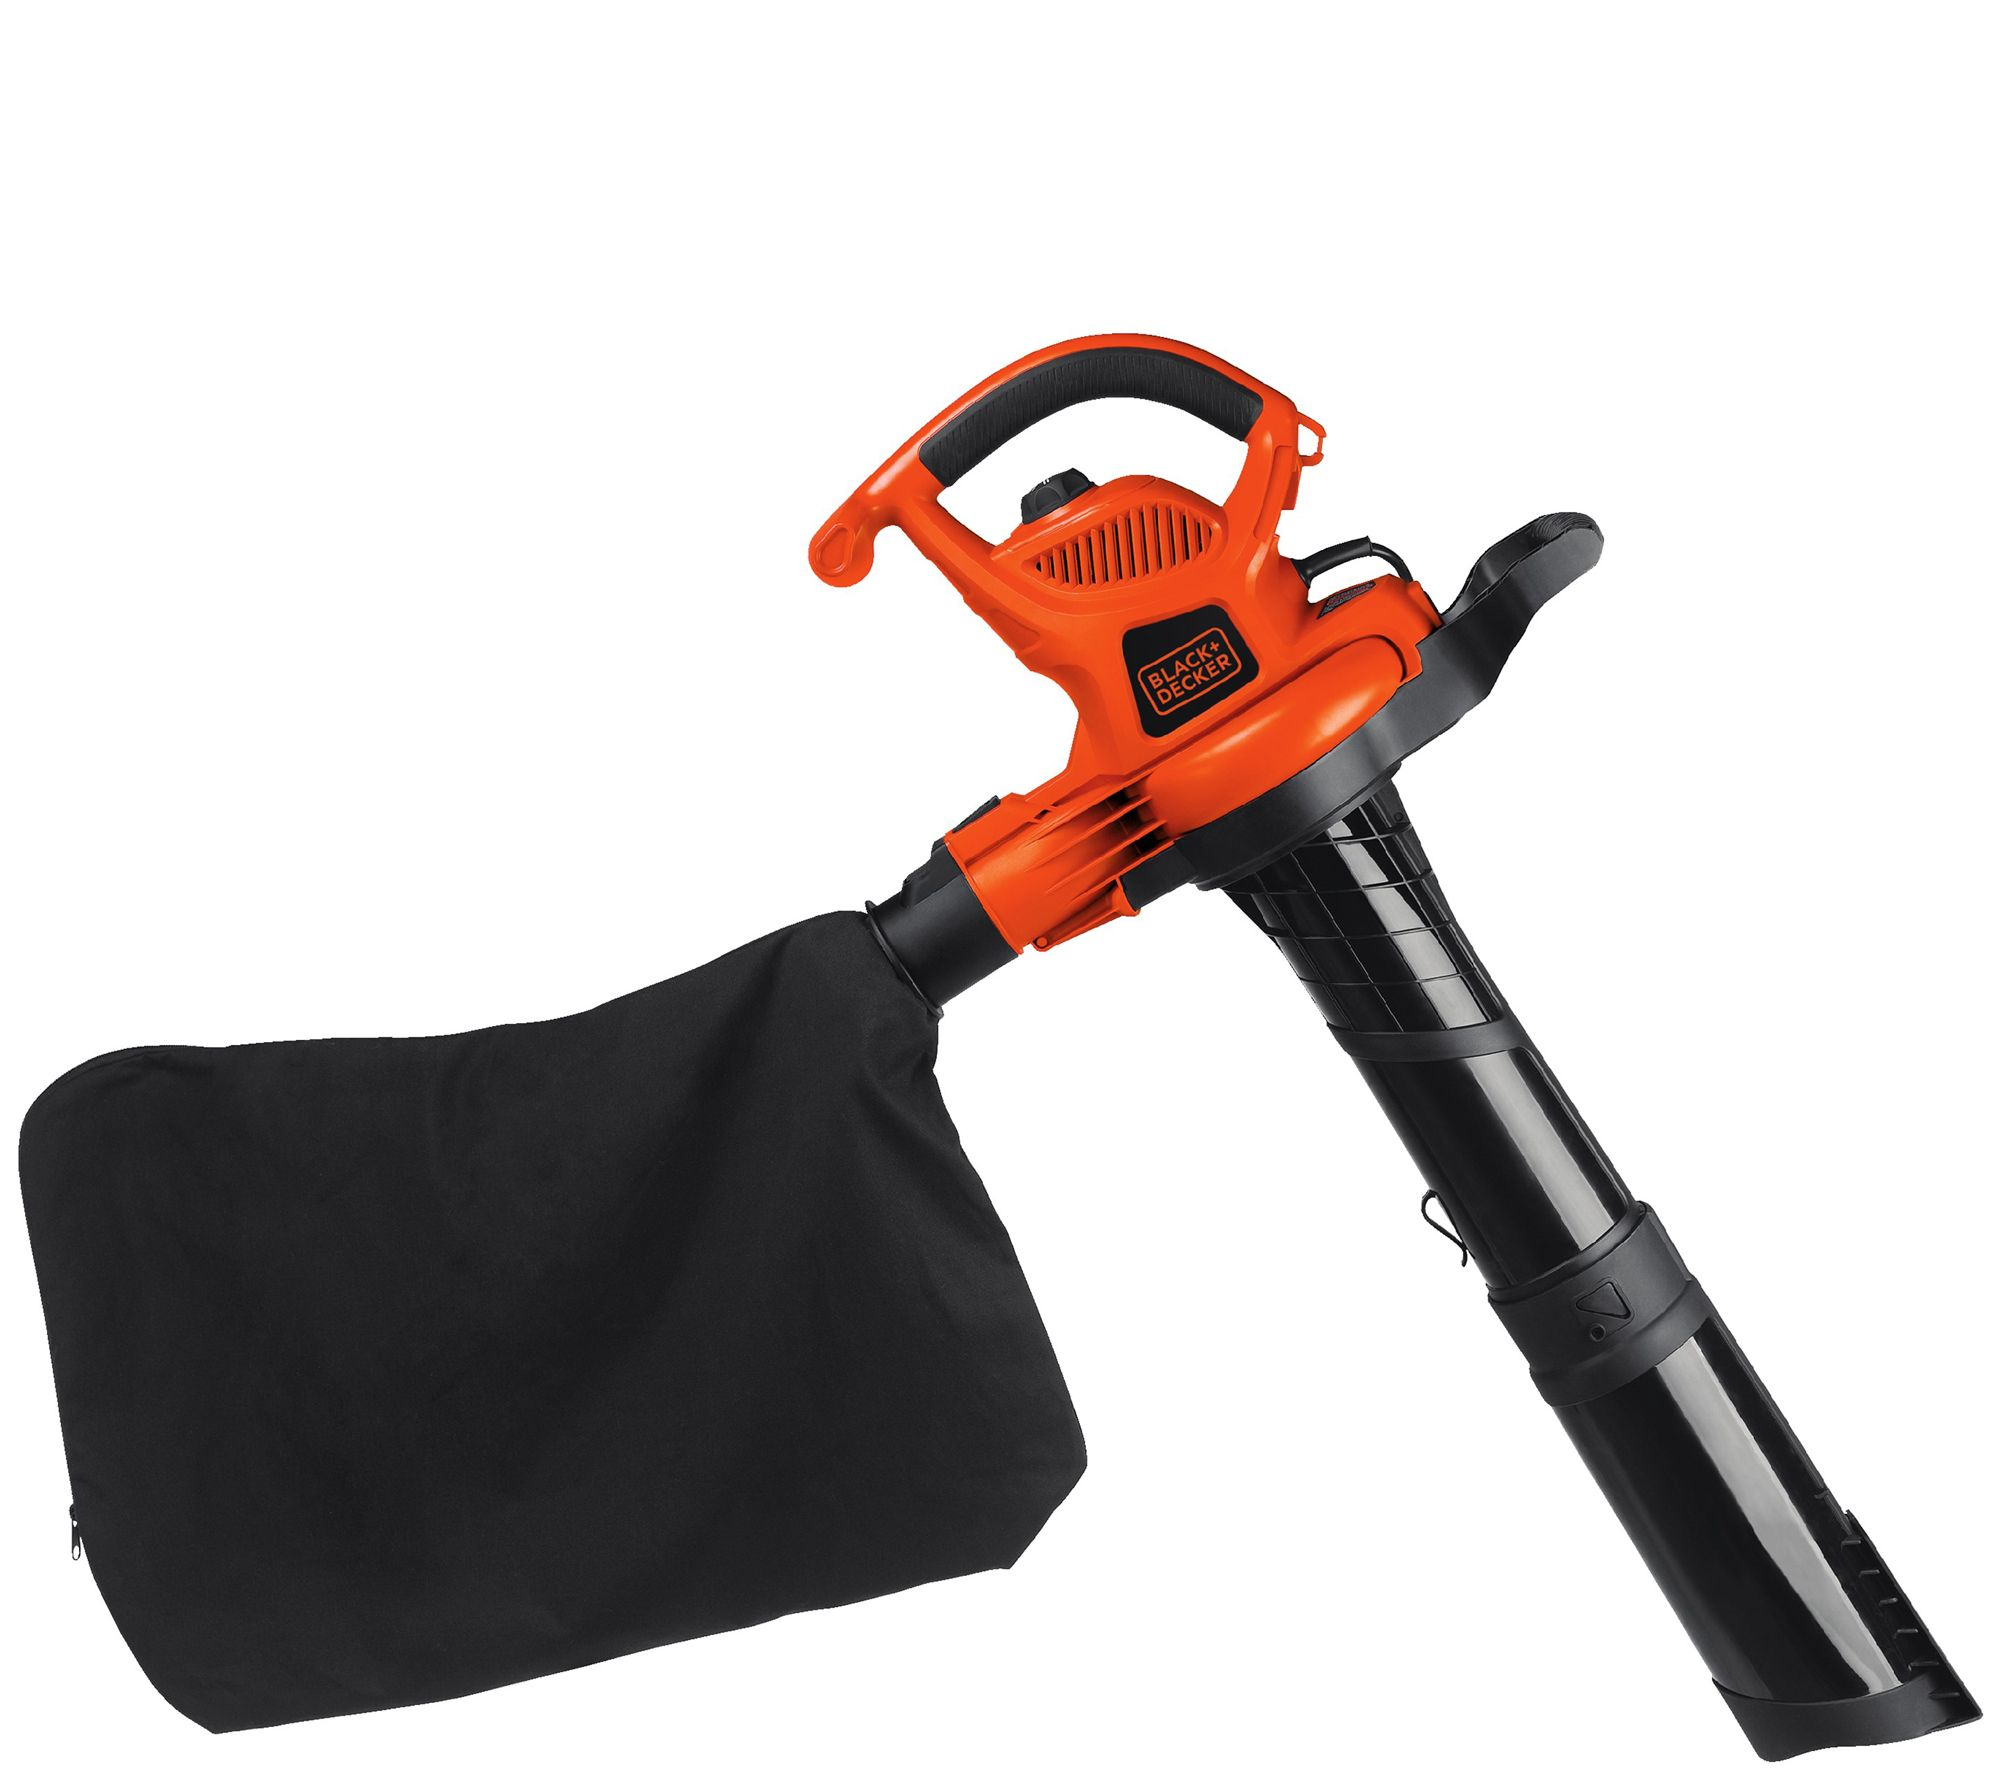 Black Amp Decker 12 Amp Blower Vac Mulcher Qvc Com